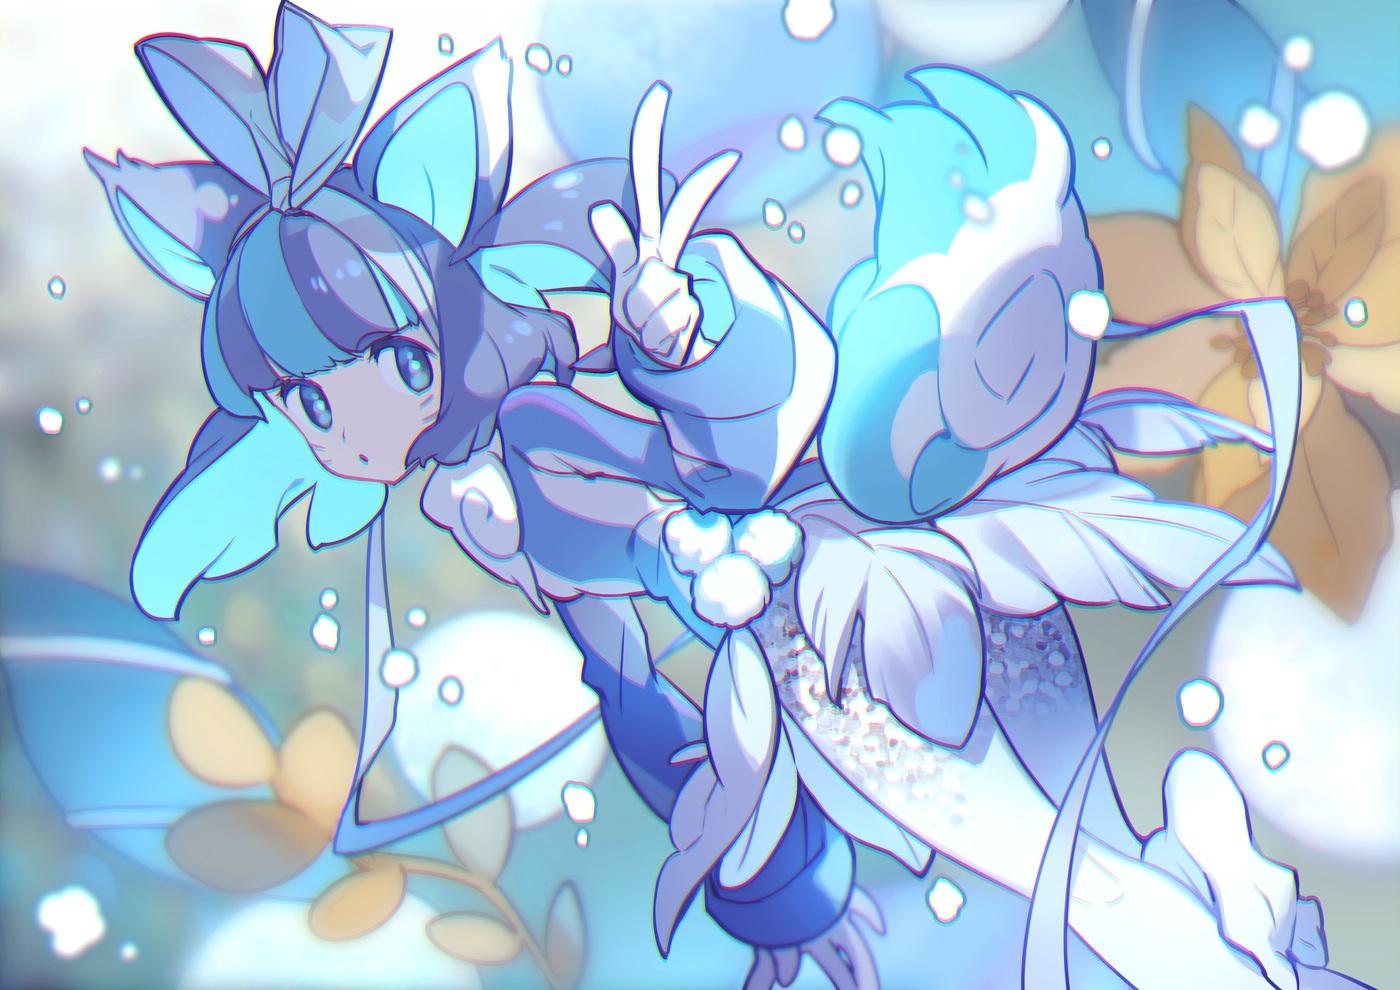 animal_ears blue_eyes blue_hair bow dress feathers flowers foxgirl gloves headband lee_hyeseung original polychromatic short_hair snow tail